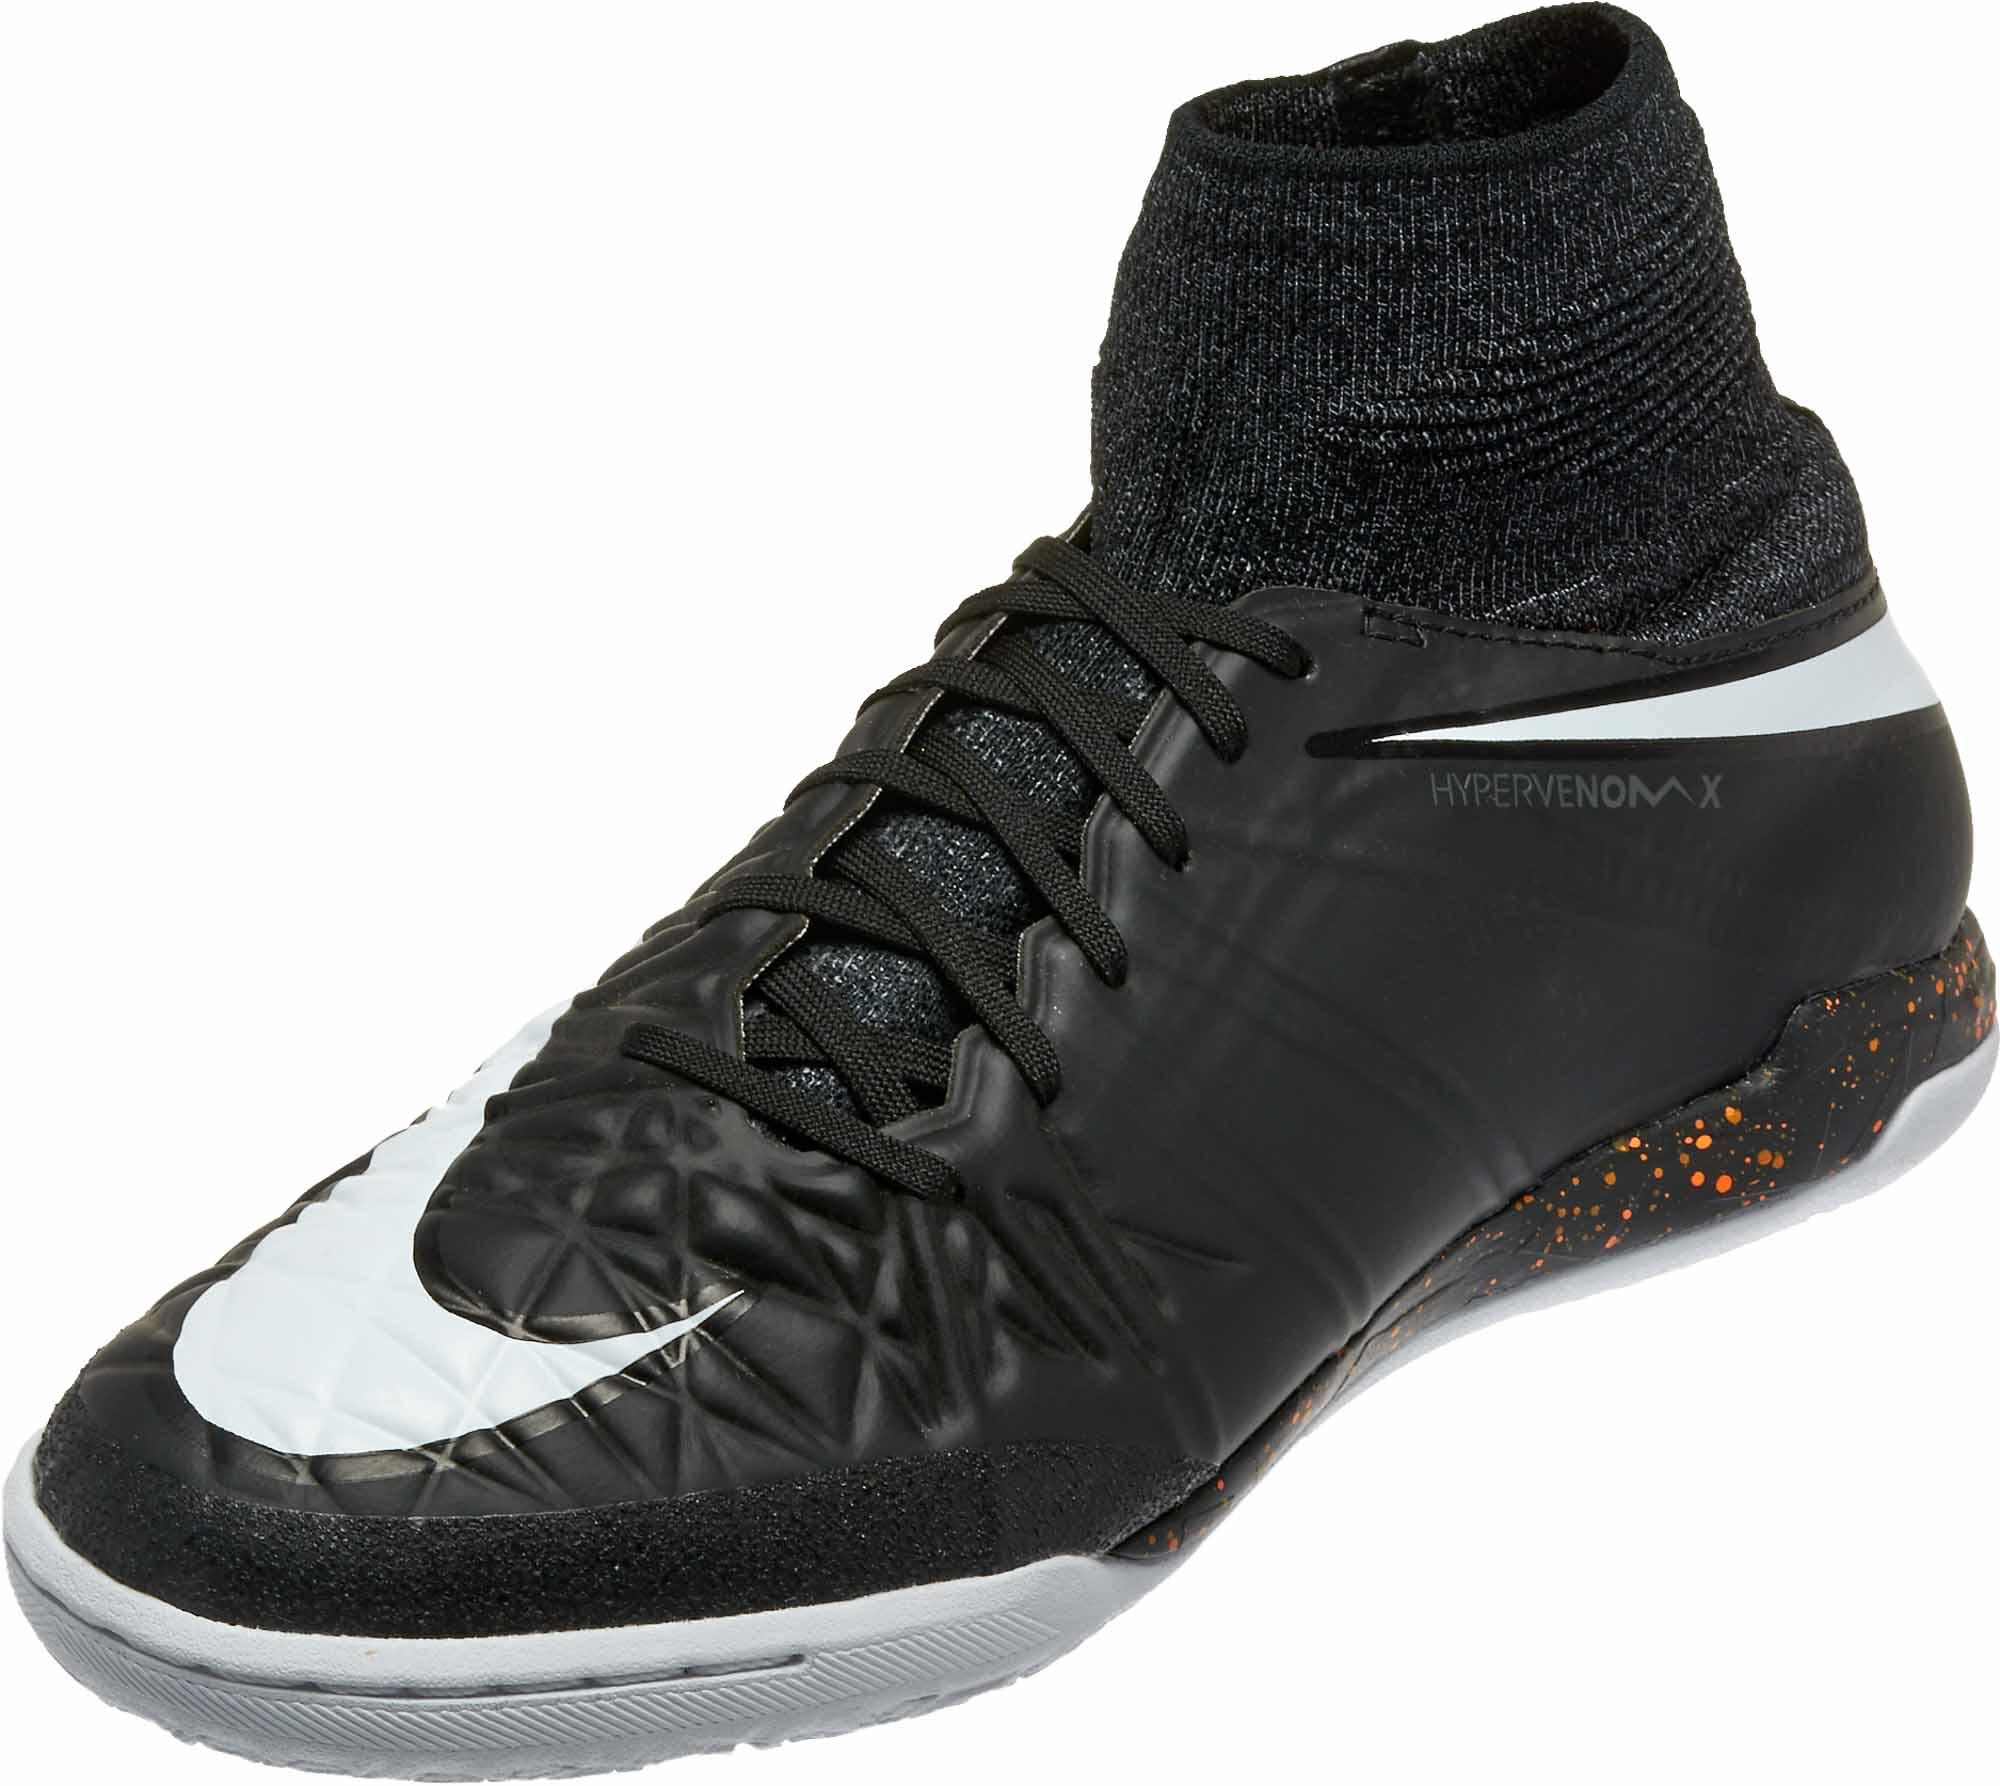 4ffe4cc94f5 Nike Youth HypervenomX Proximo Street - Kids Nike IC Soccer Shoes